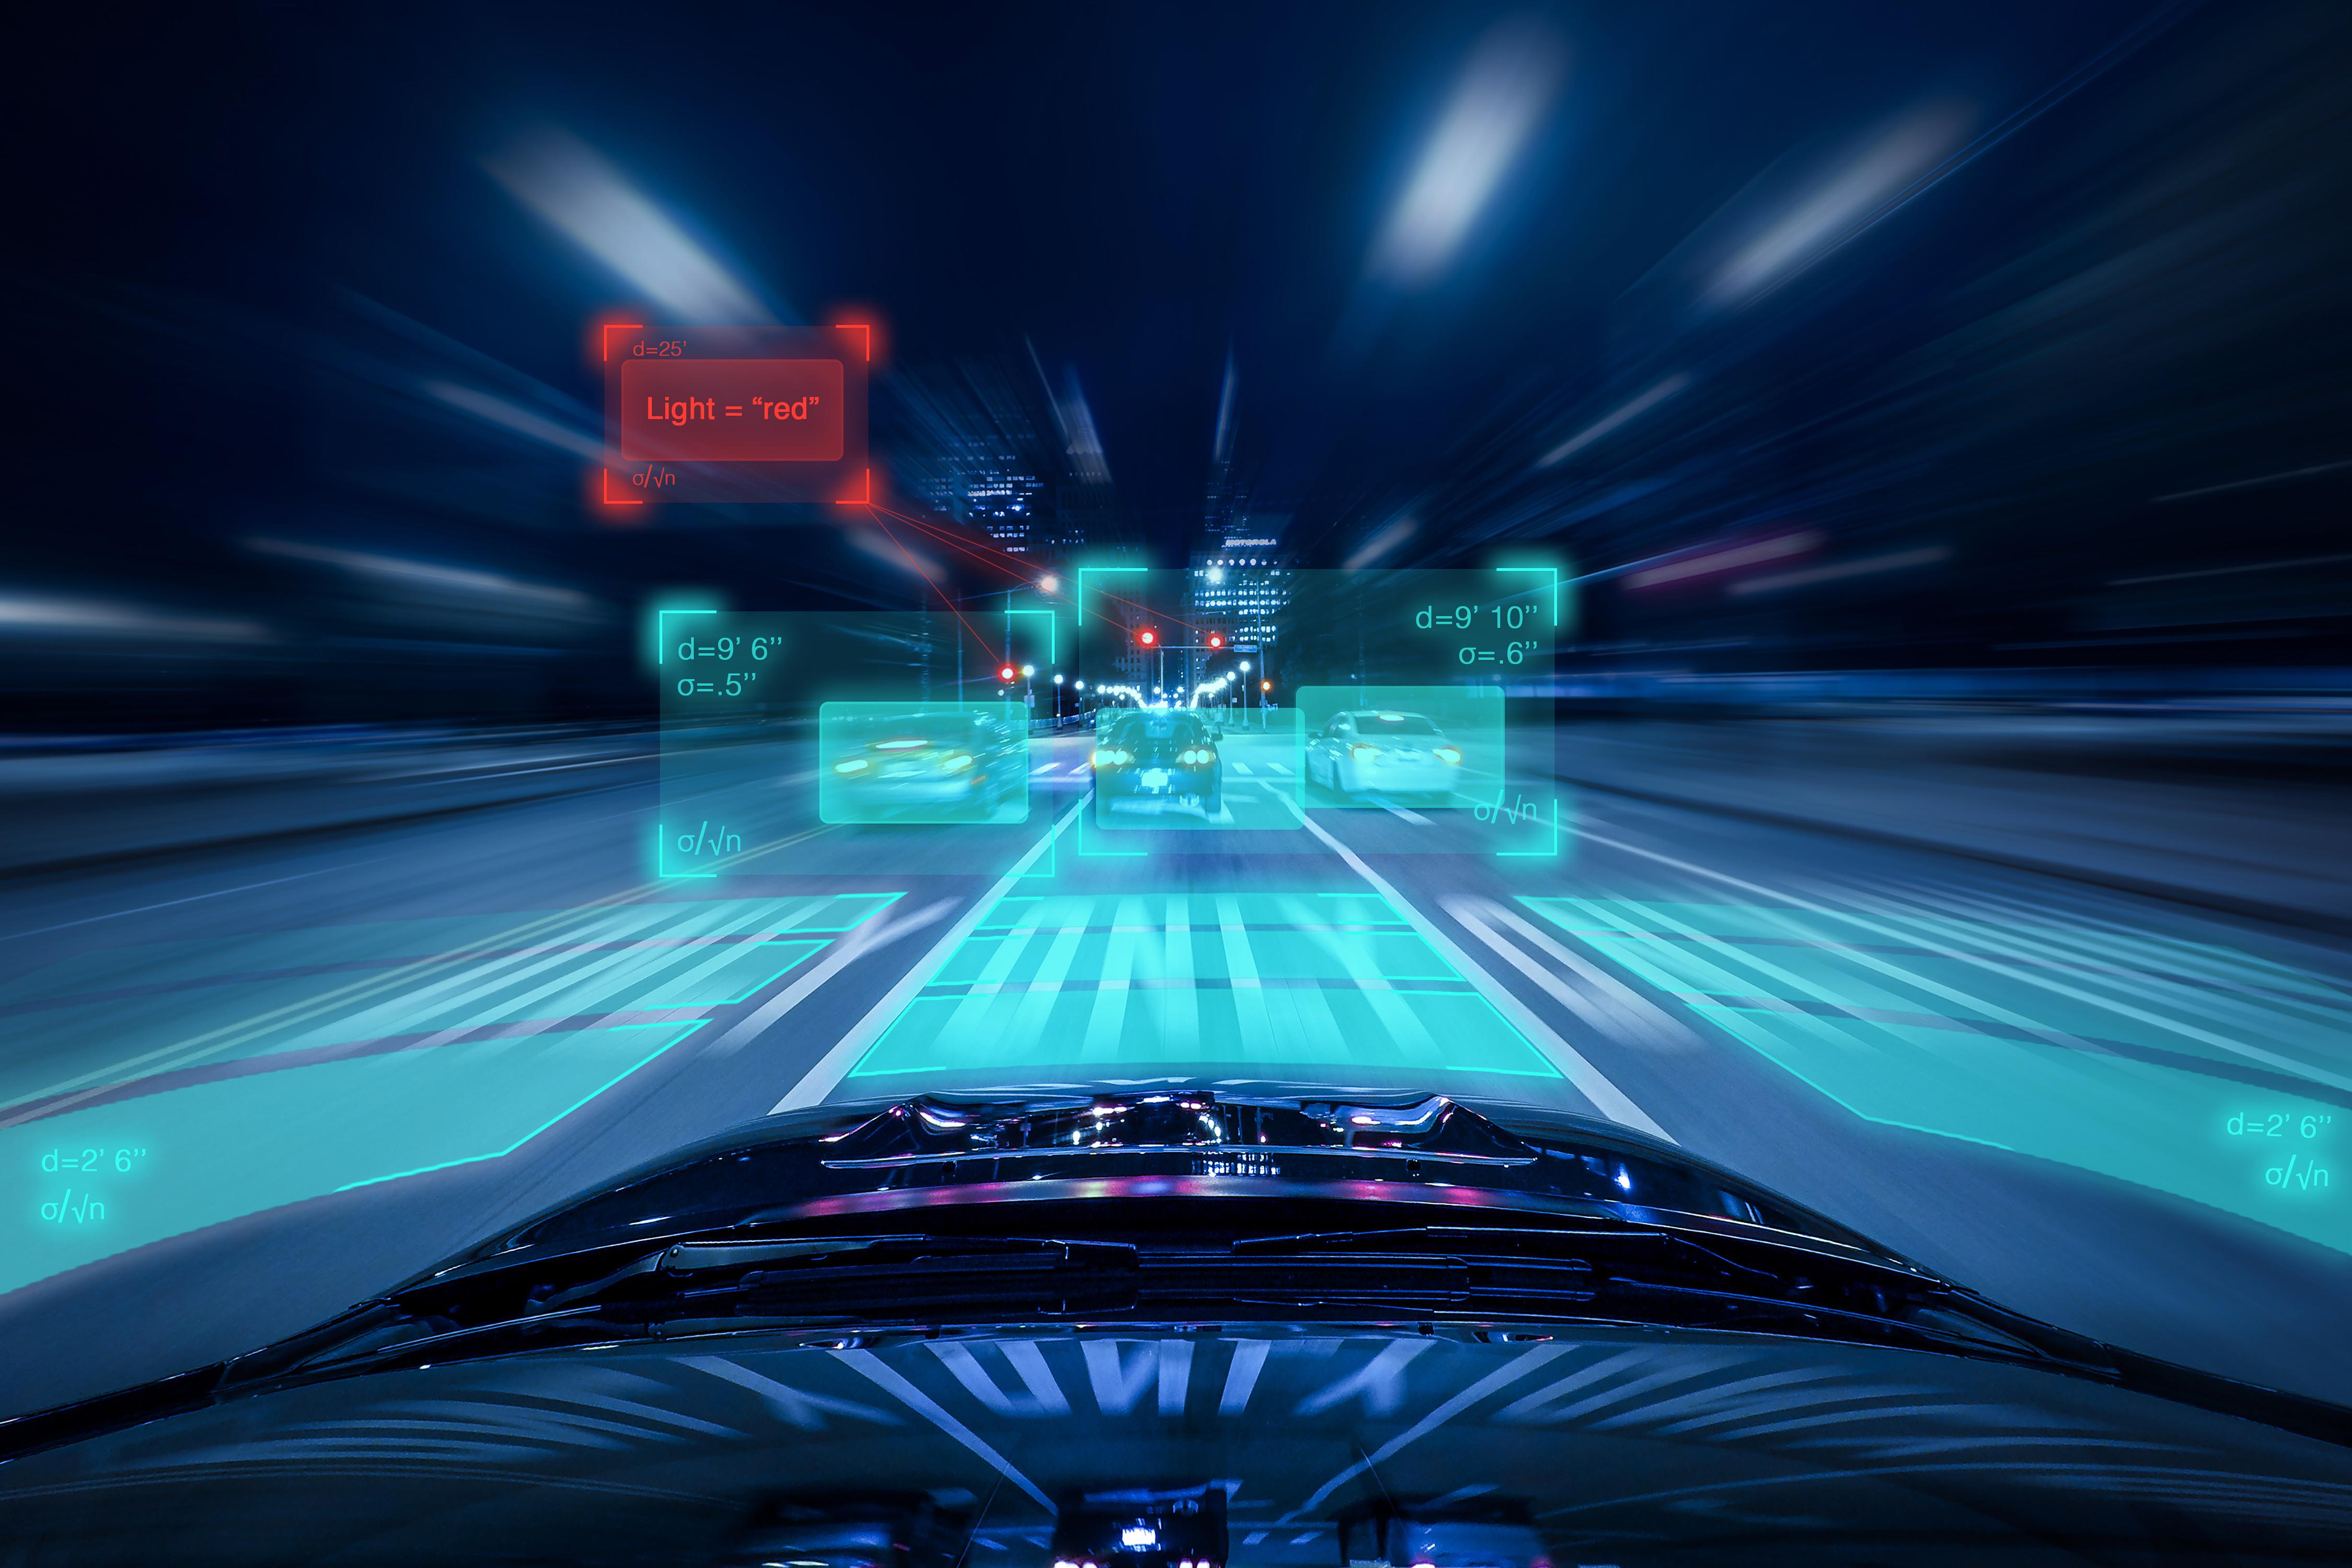 Autonomous Vehicles: Diverse Group Seeks to Answer Broad